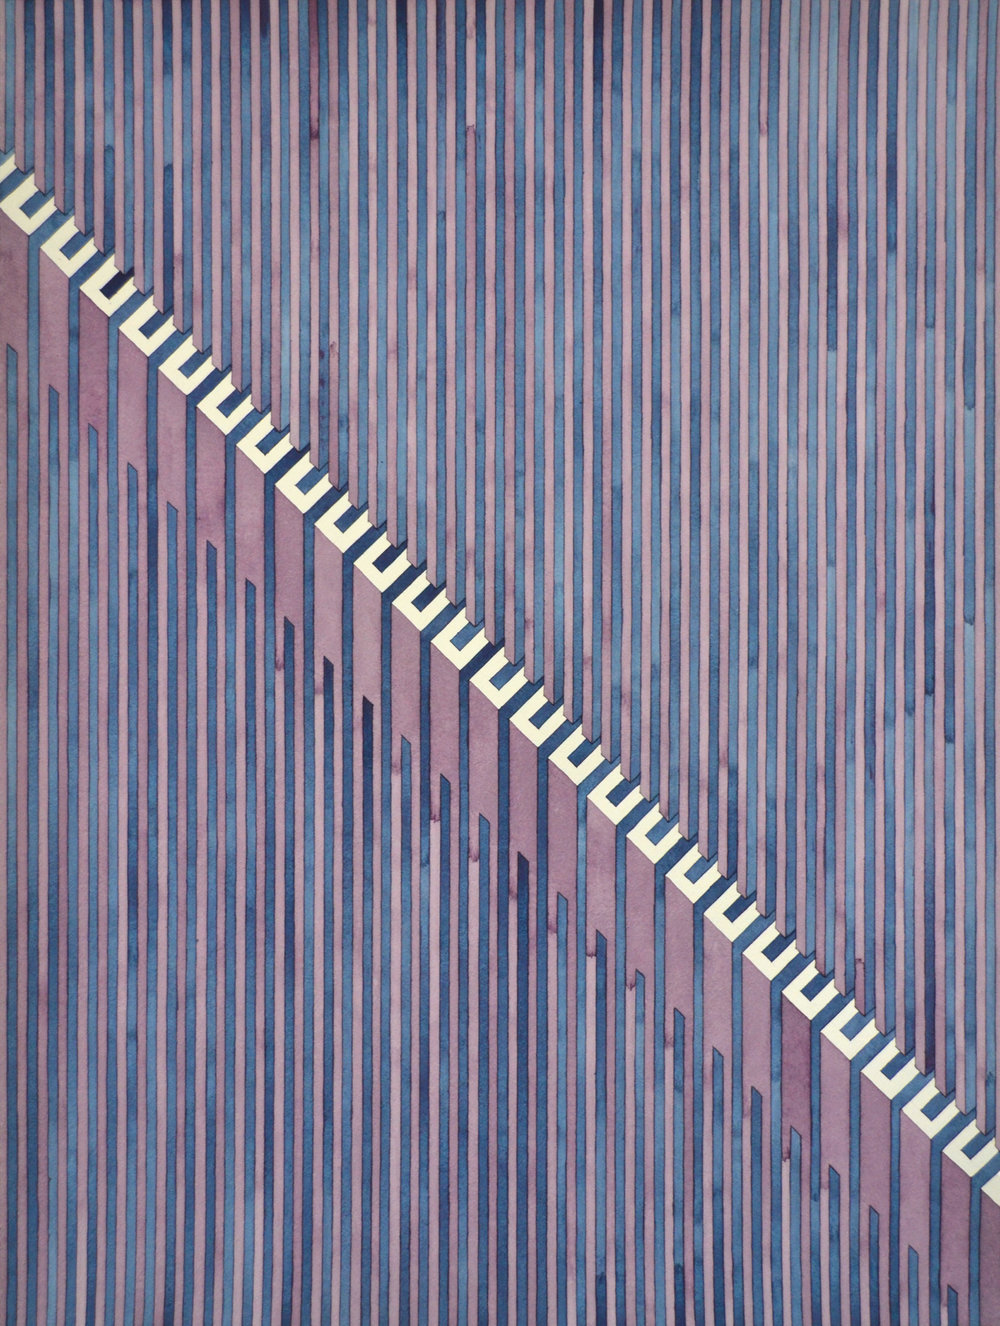 Visage (deficient), 2019  watercolor graphite on watercolor paper  24 x 18 inches